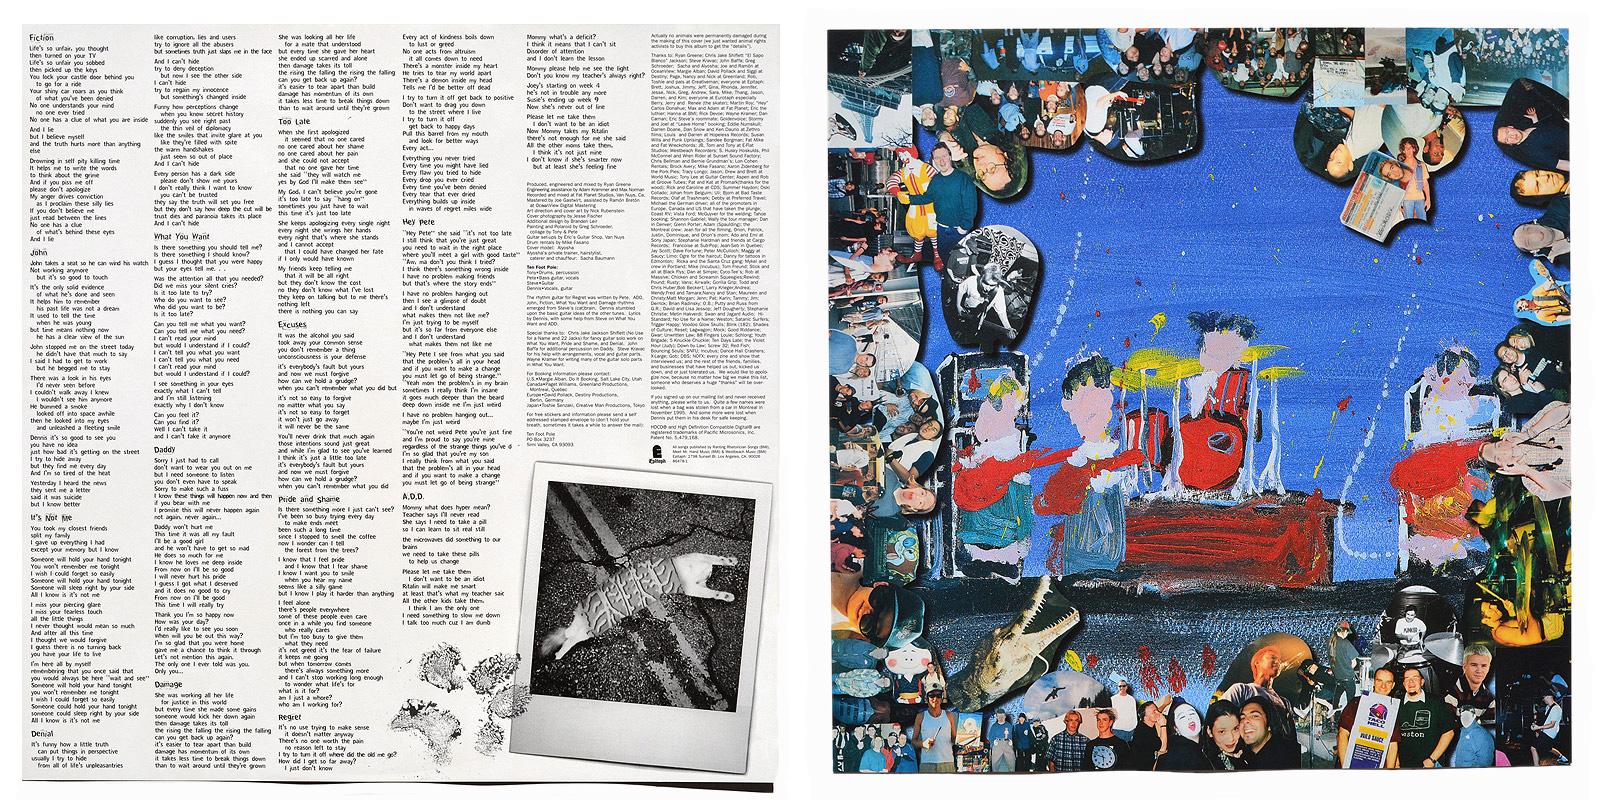 Ten Foot Pole Punk Vinyl Collector